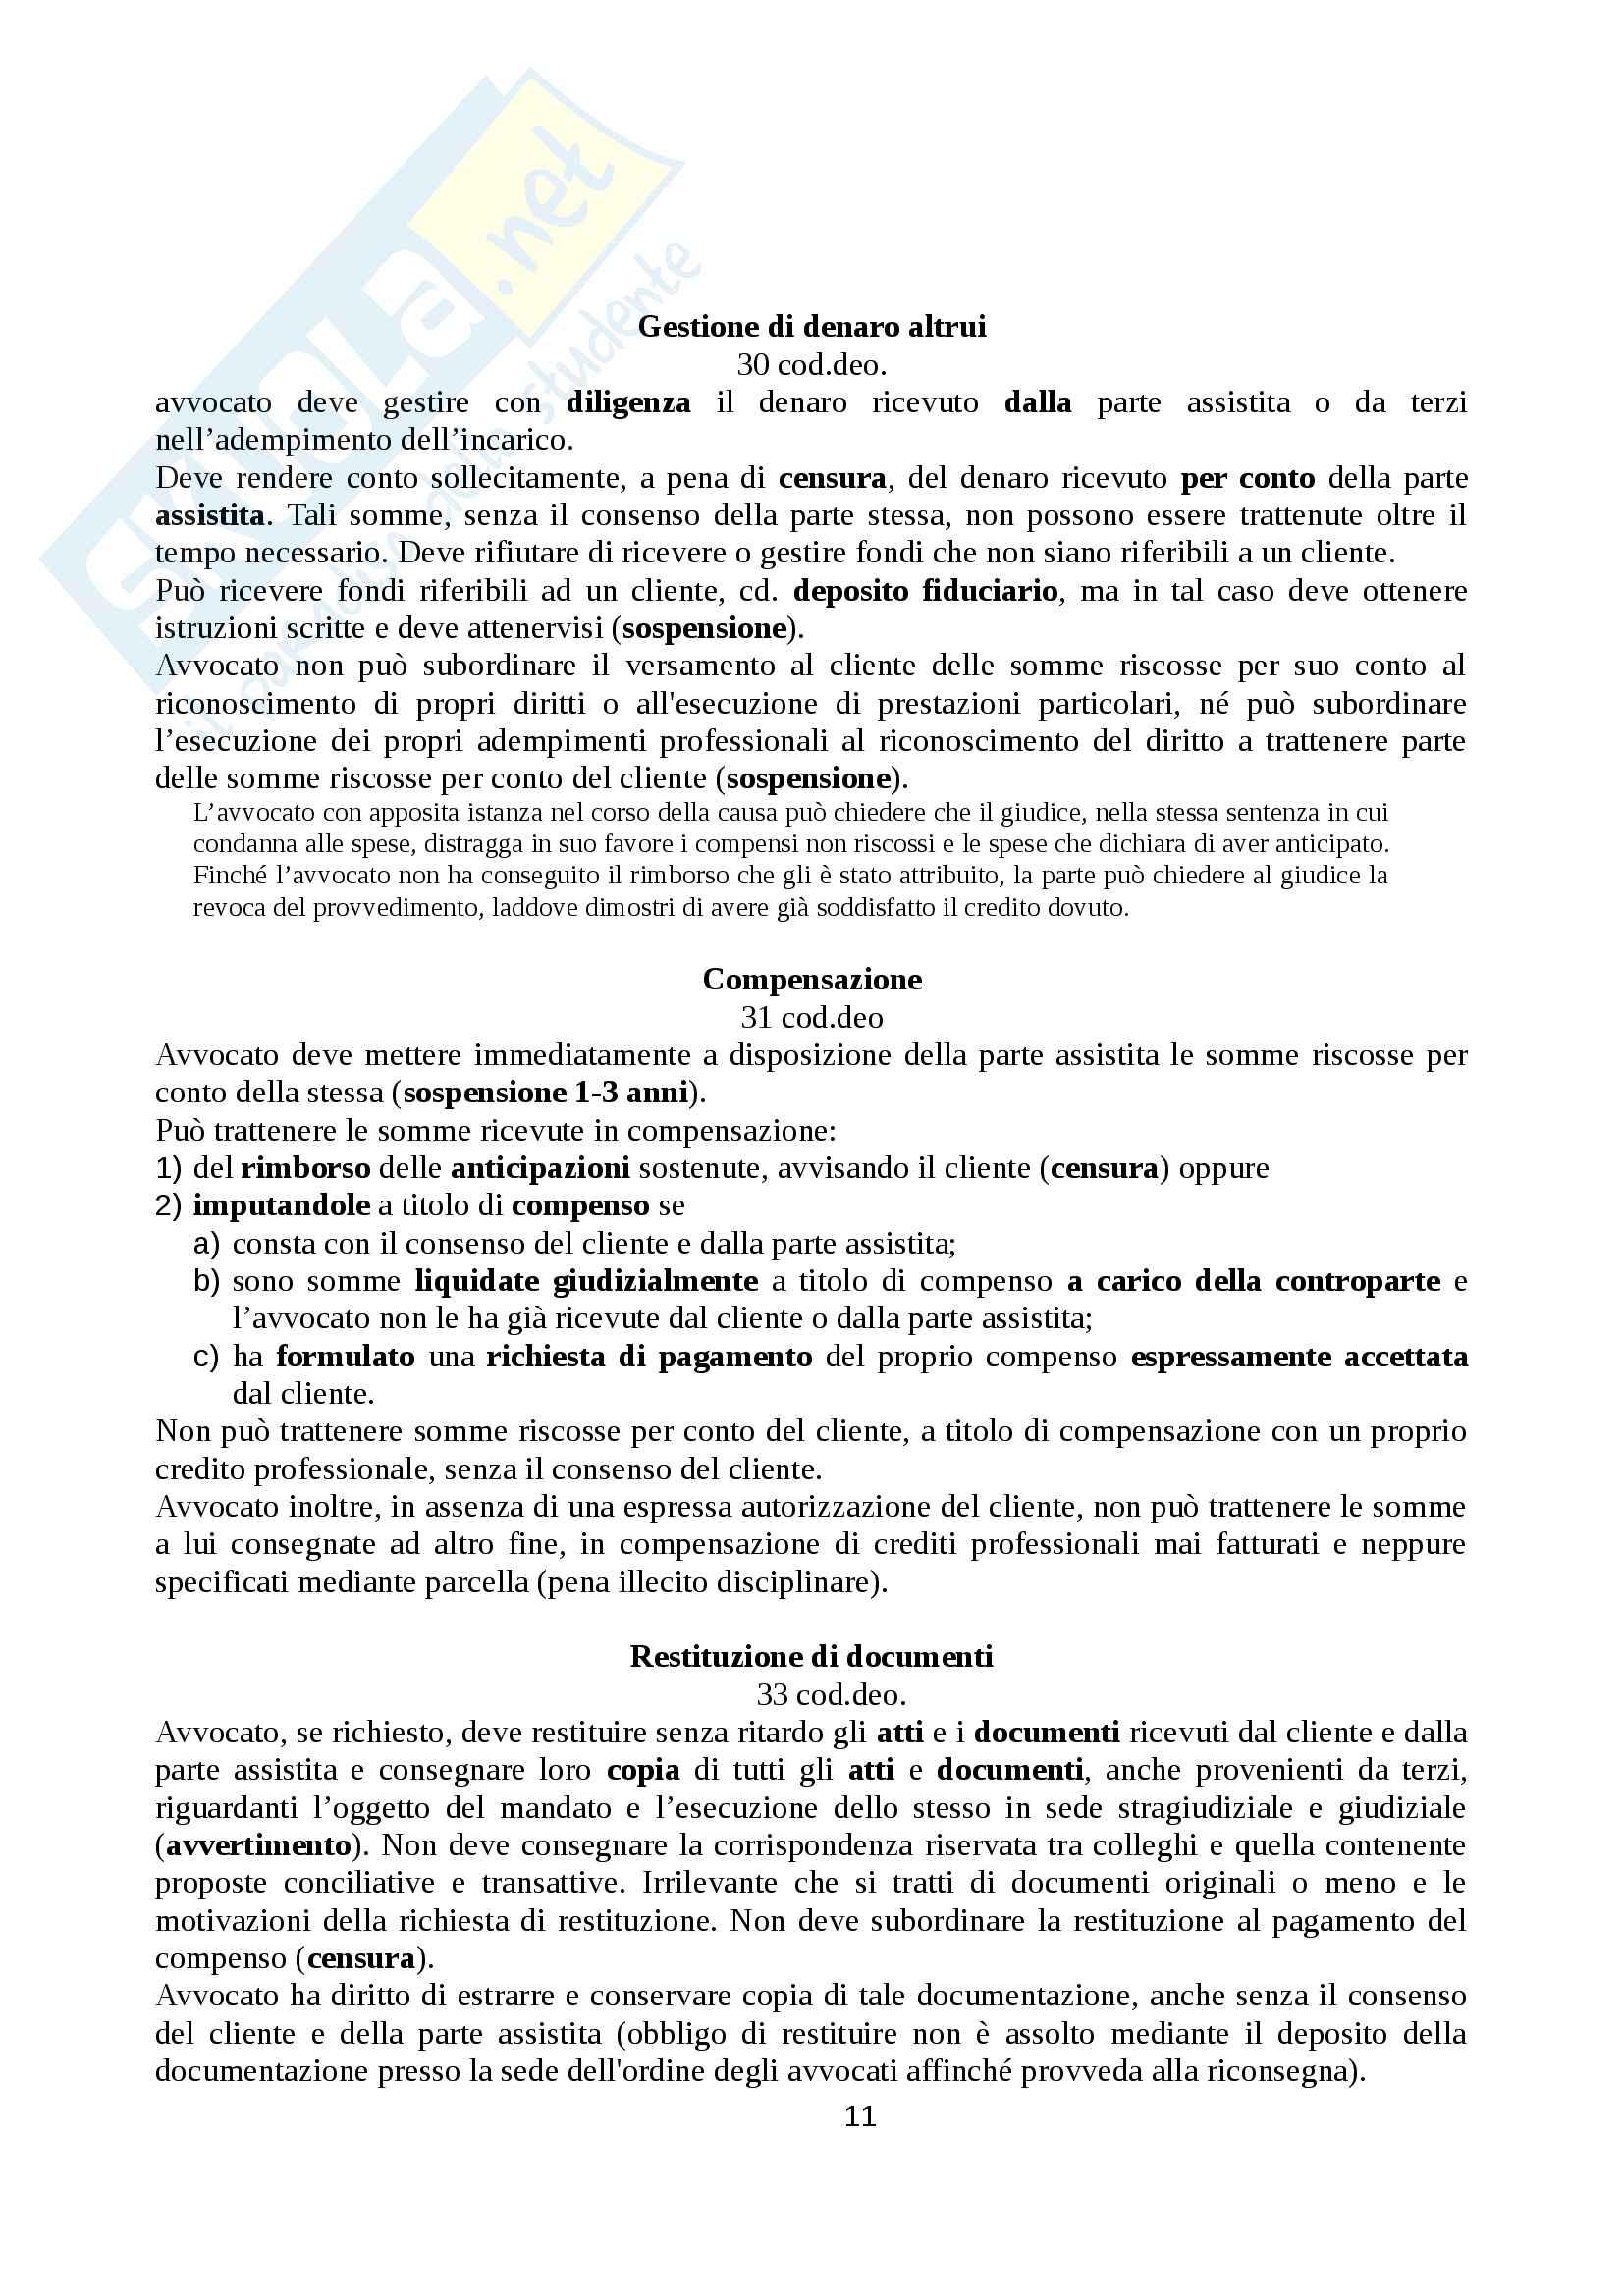 Ordinamento e deontologia forense Esame da Avvocato Pag. 11